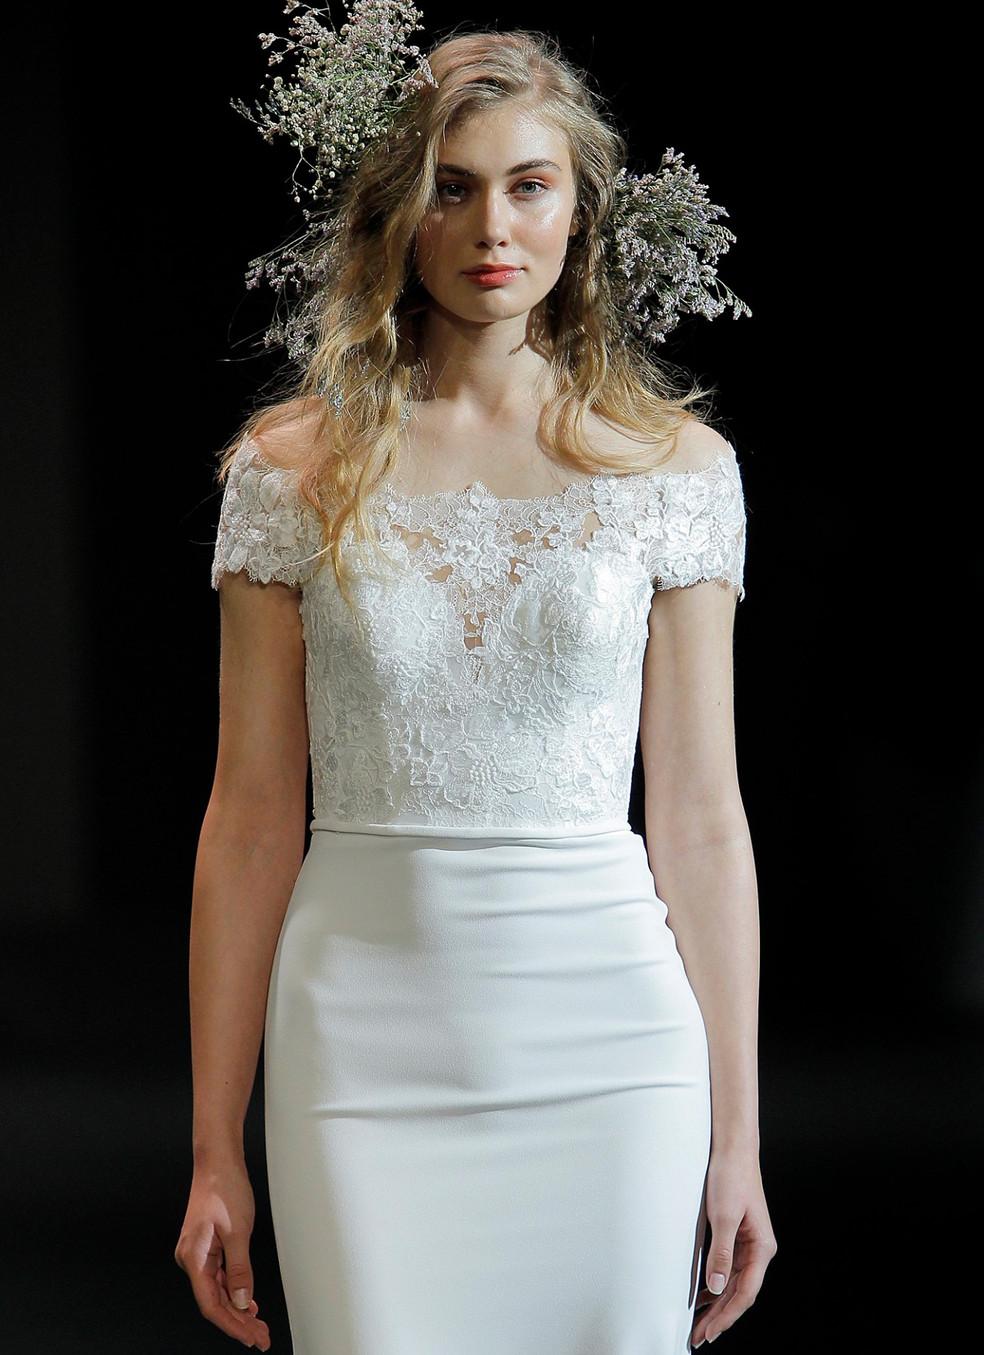 Shadevenne Alta Costura - Vestido de Noiva